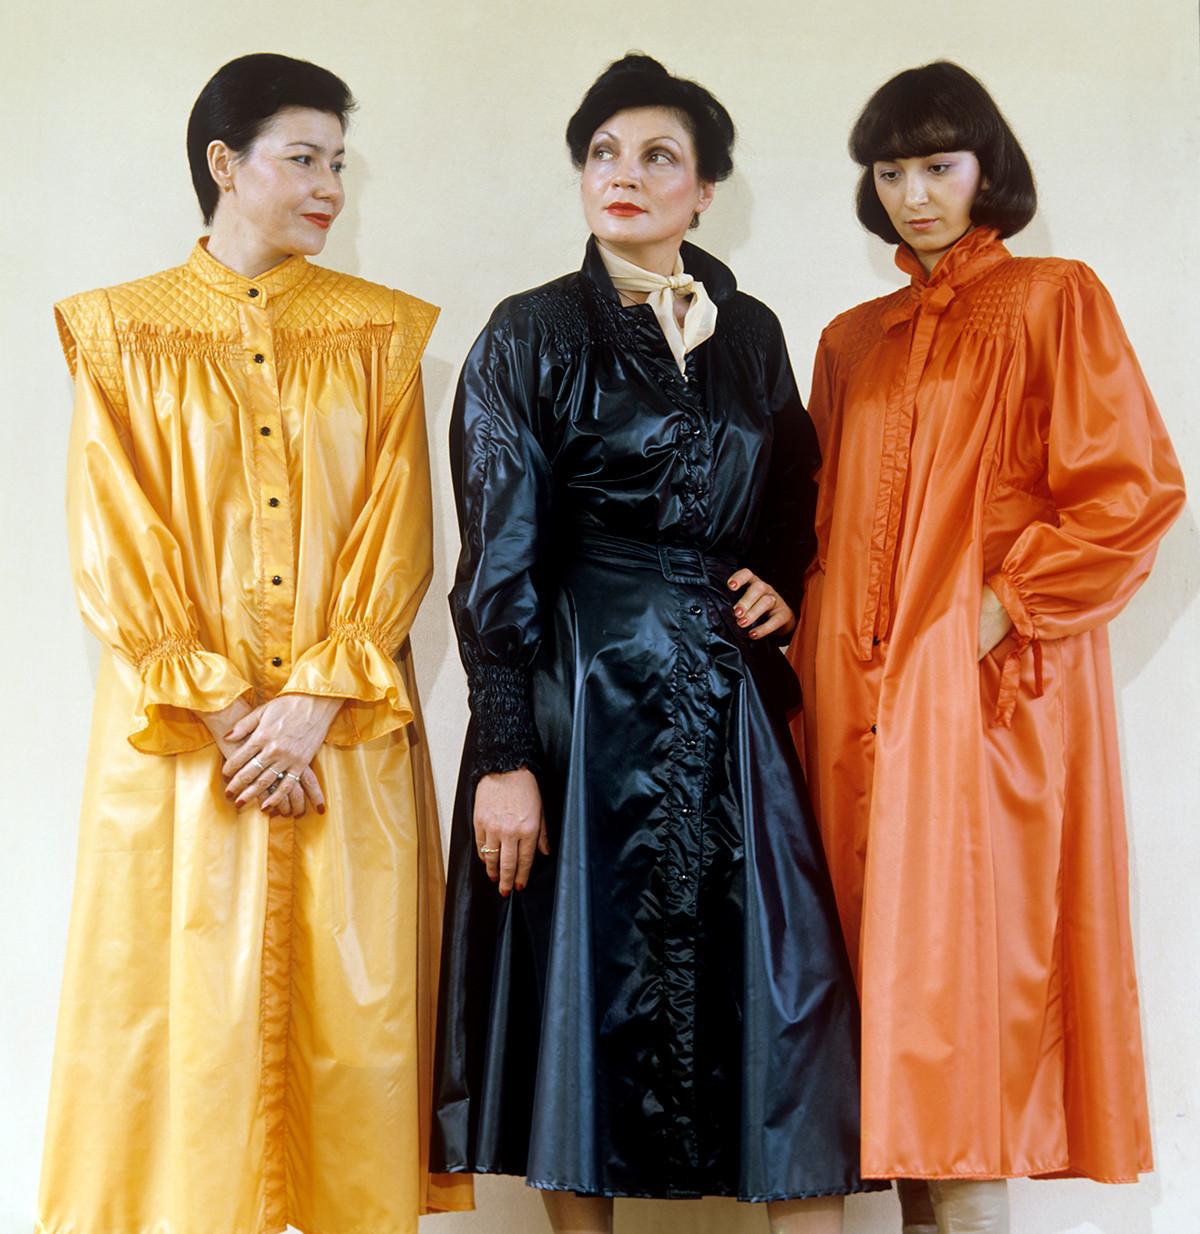 Modelle sovietiche, 1982